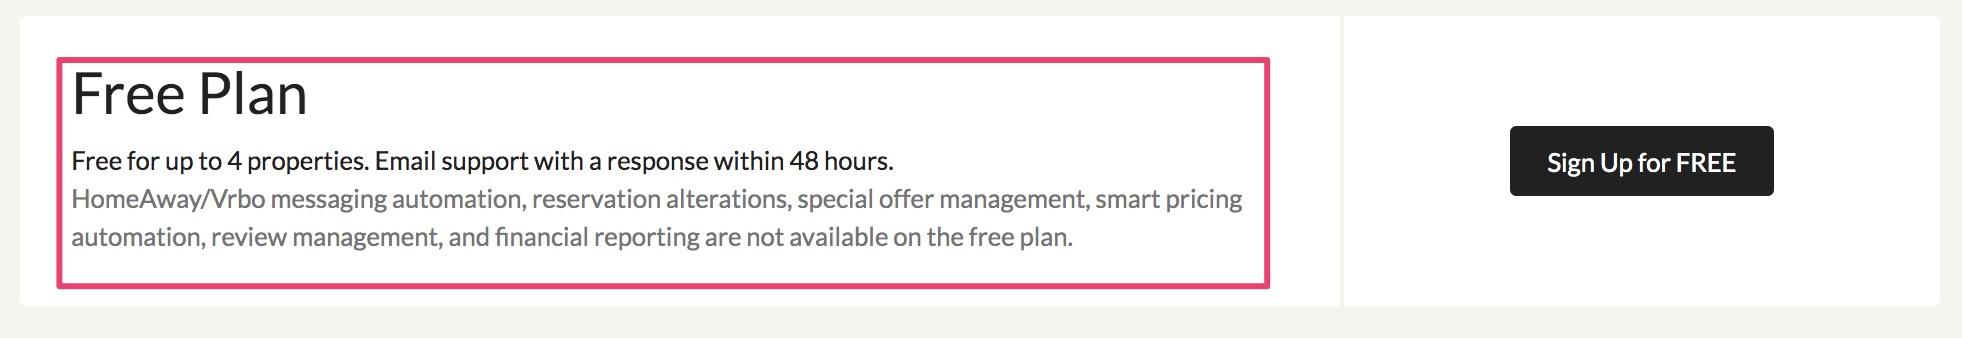 IGMS free plan